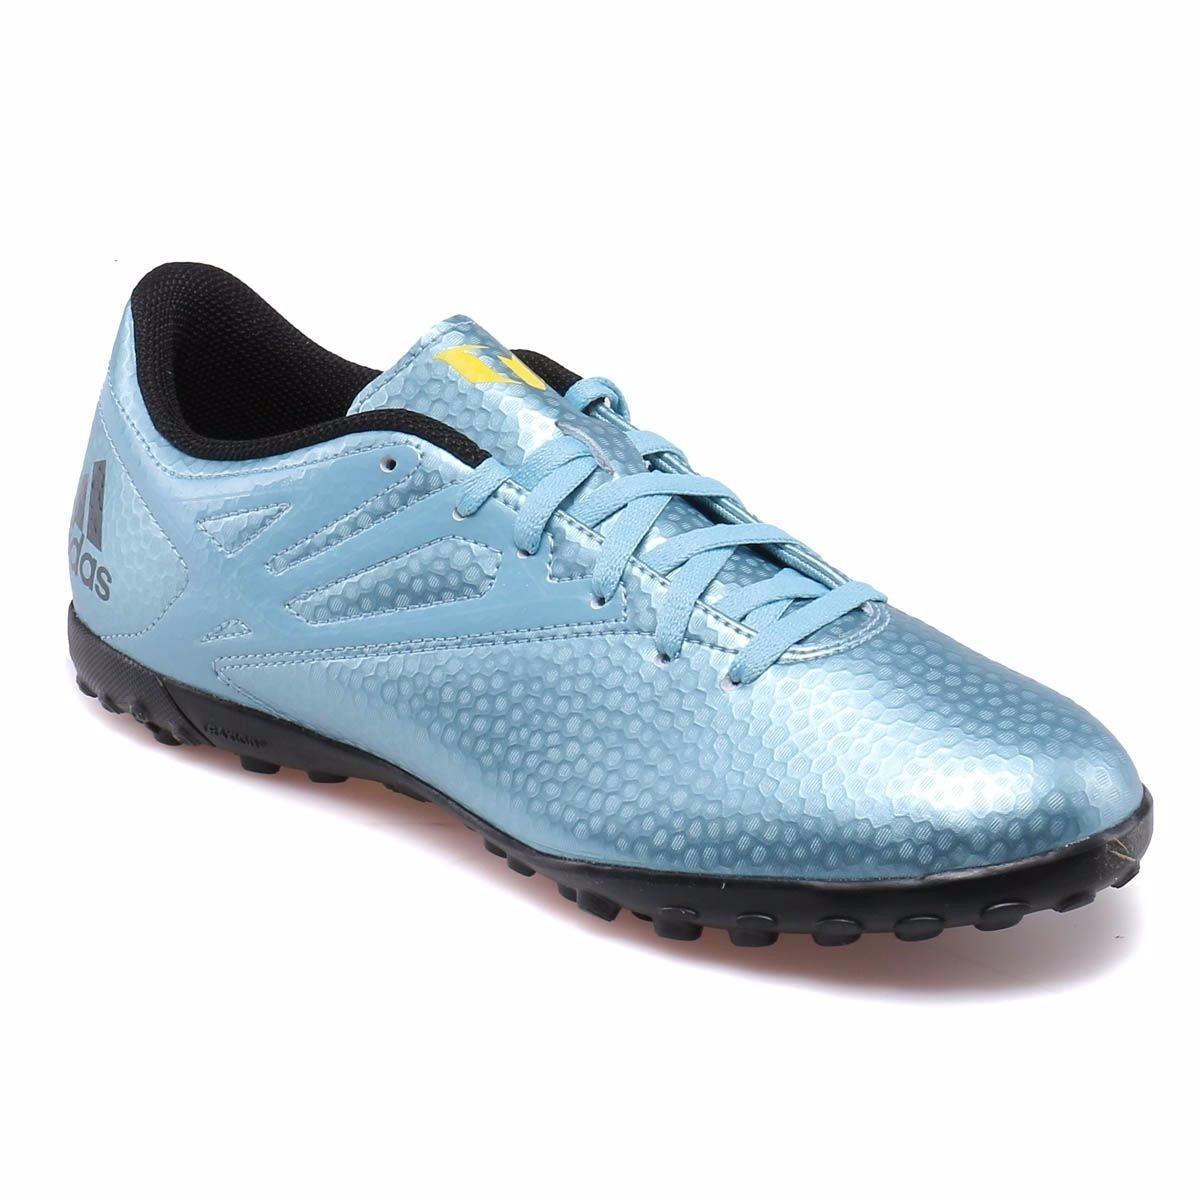 5d09706f14 ... Botines Nike adidas Puma Papi Futbol Mercurial Messi Ace - 1.799 ...  promo codes ...